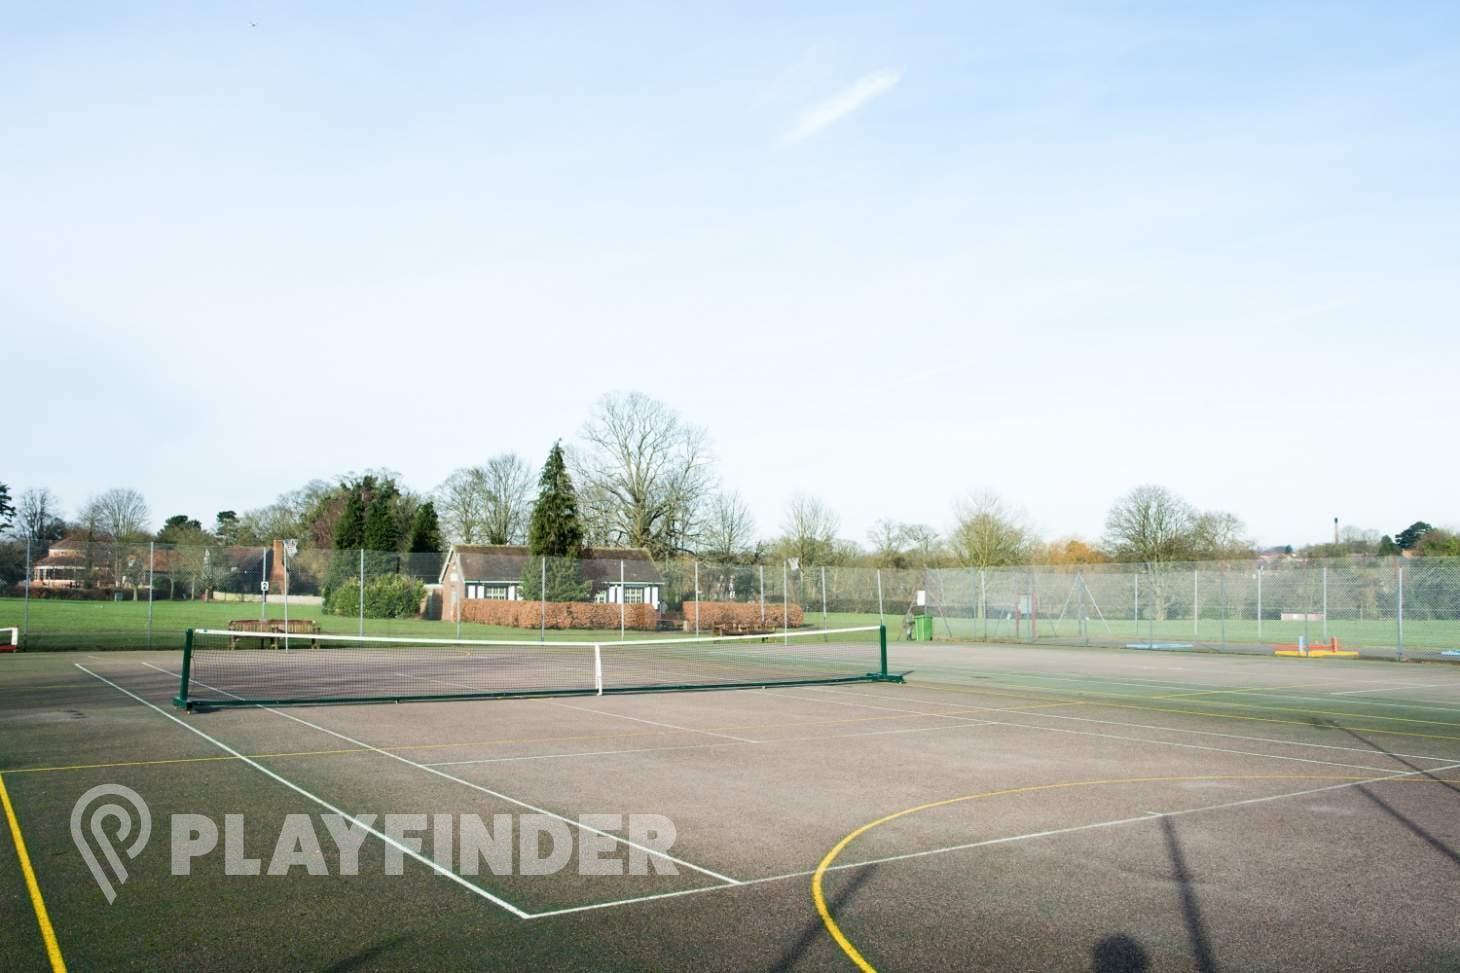 Abbey View Golf Course Outdoor | Hard (macadam) netball court